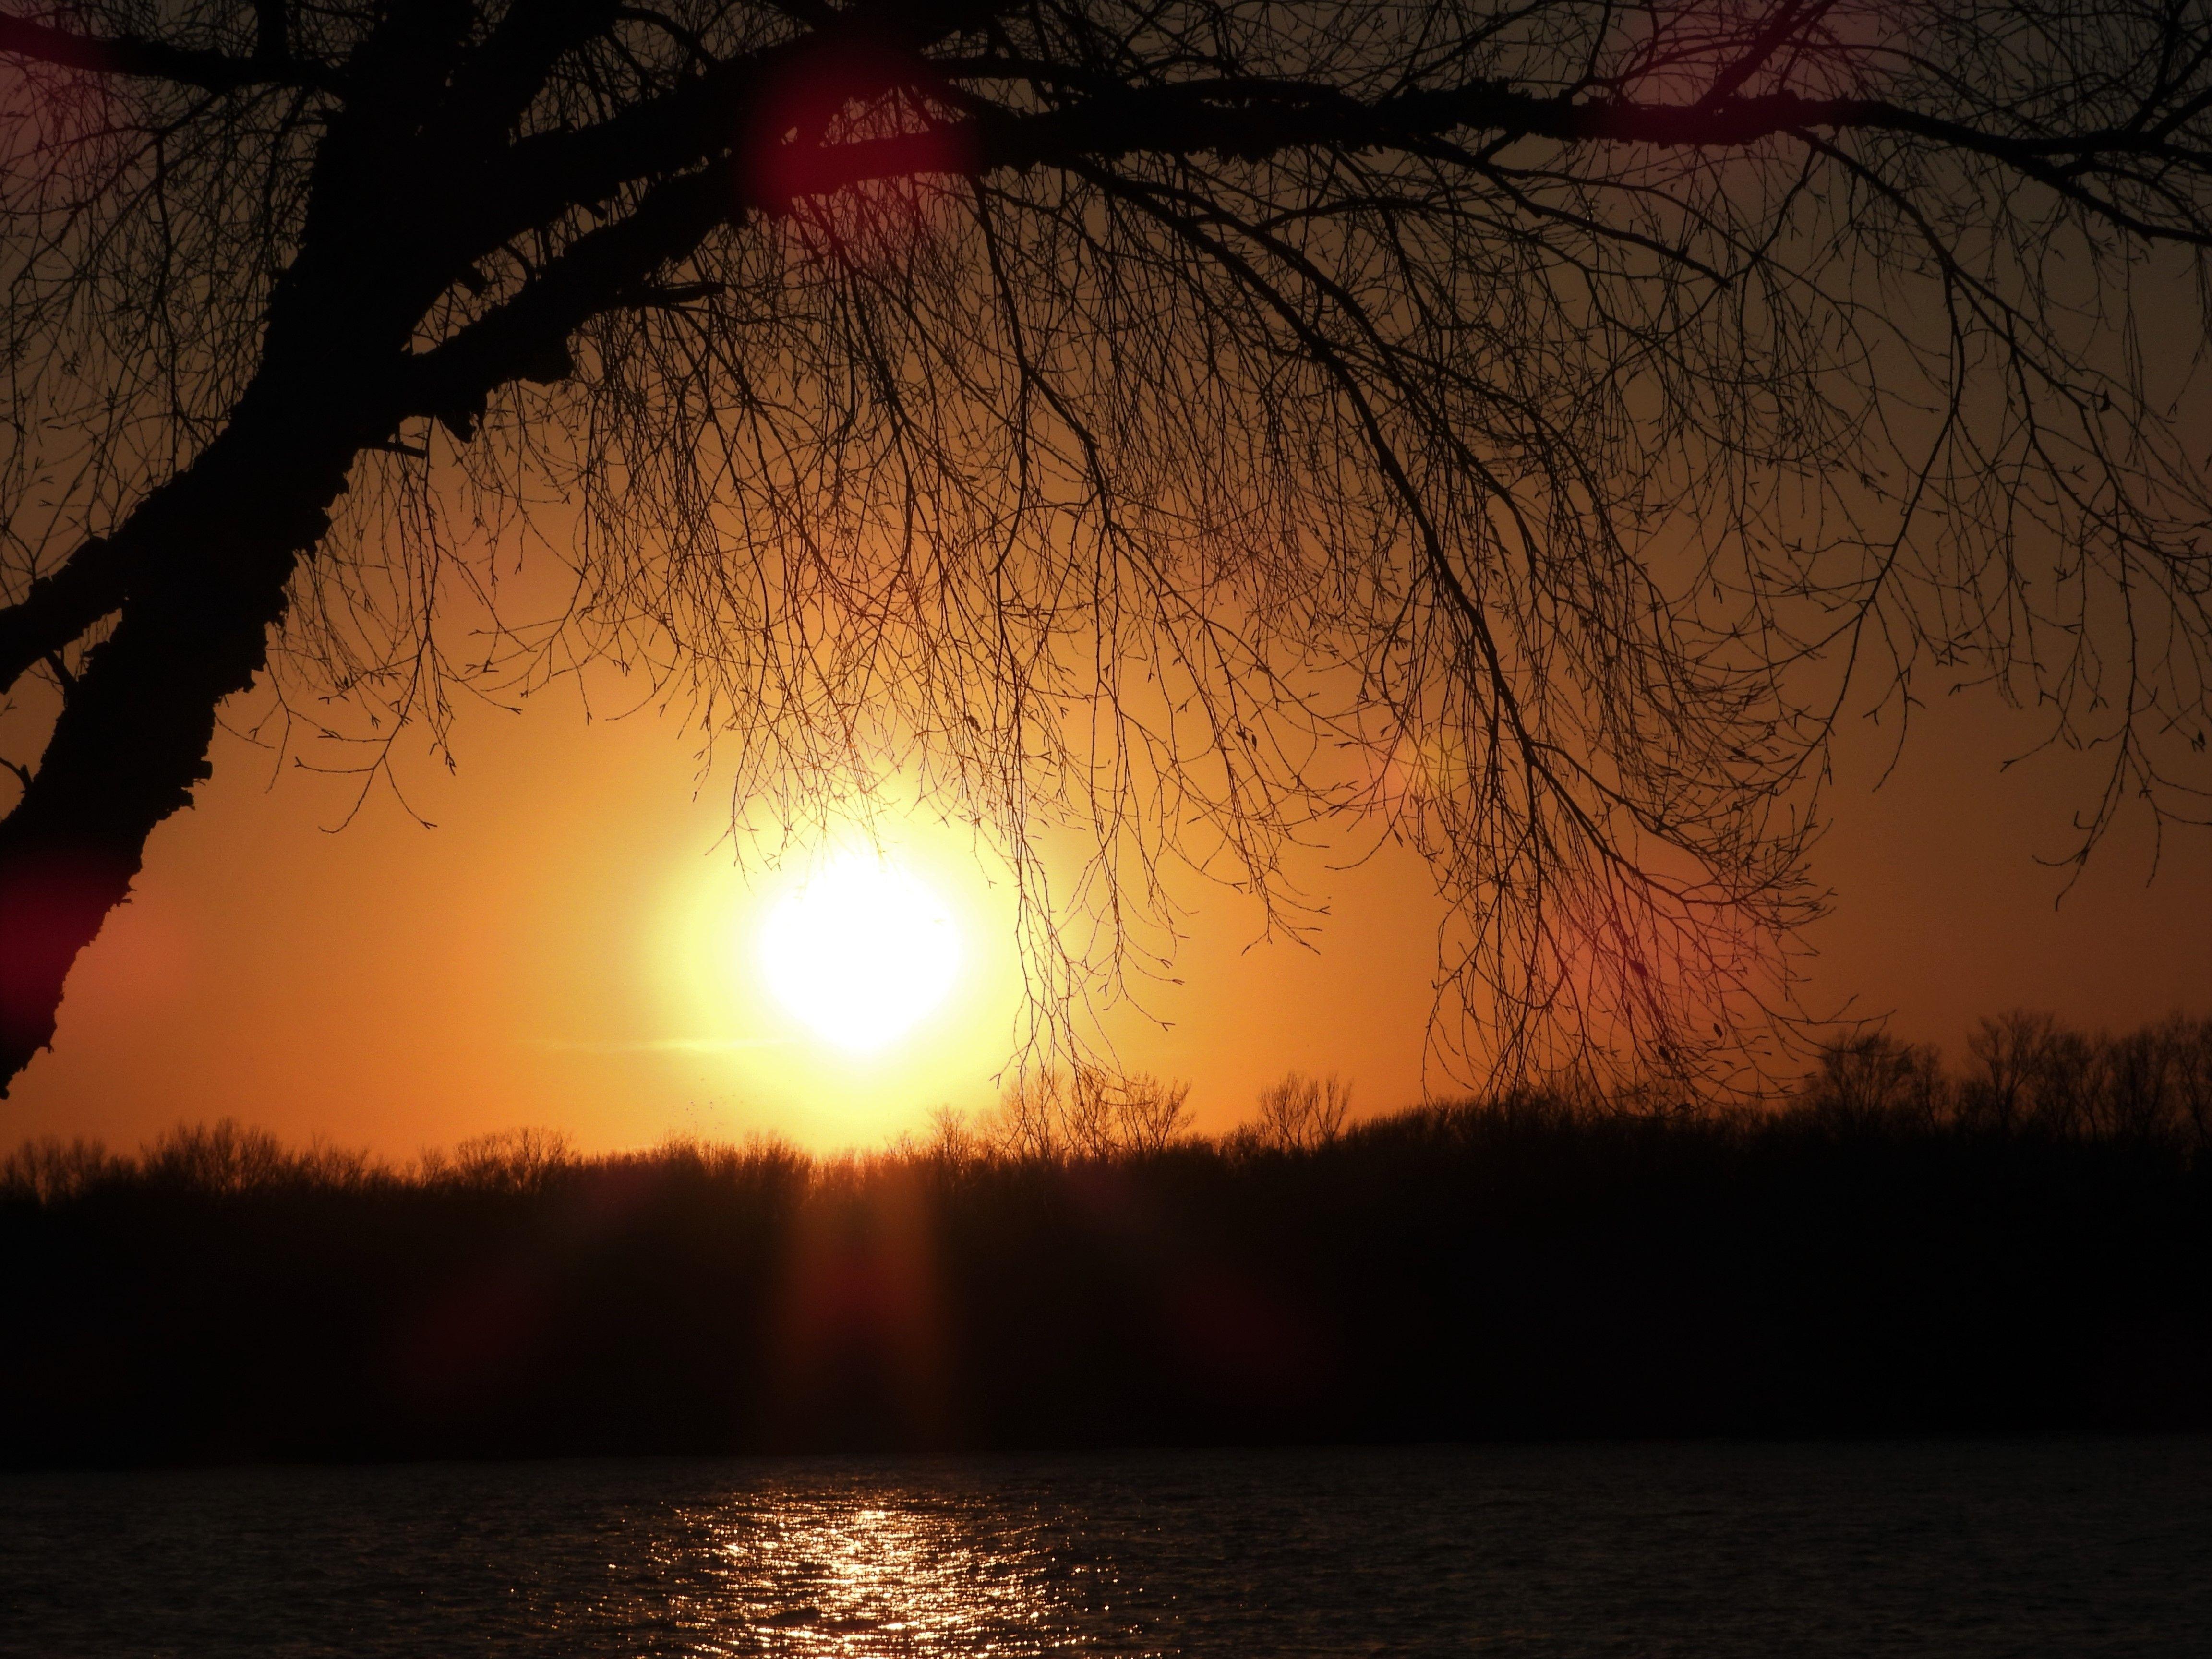 Sunset Savanna IL March 8 2020 by Ken Groezinger in 2020